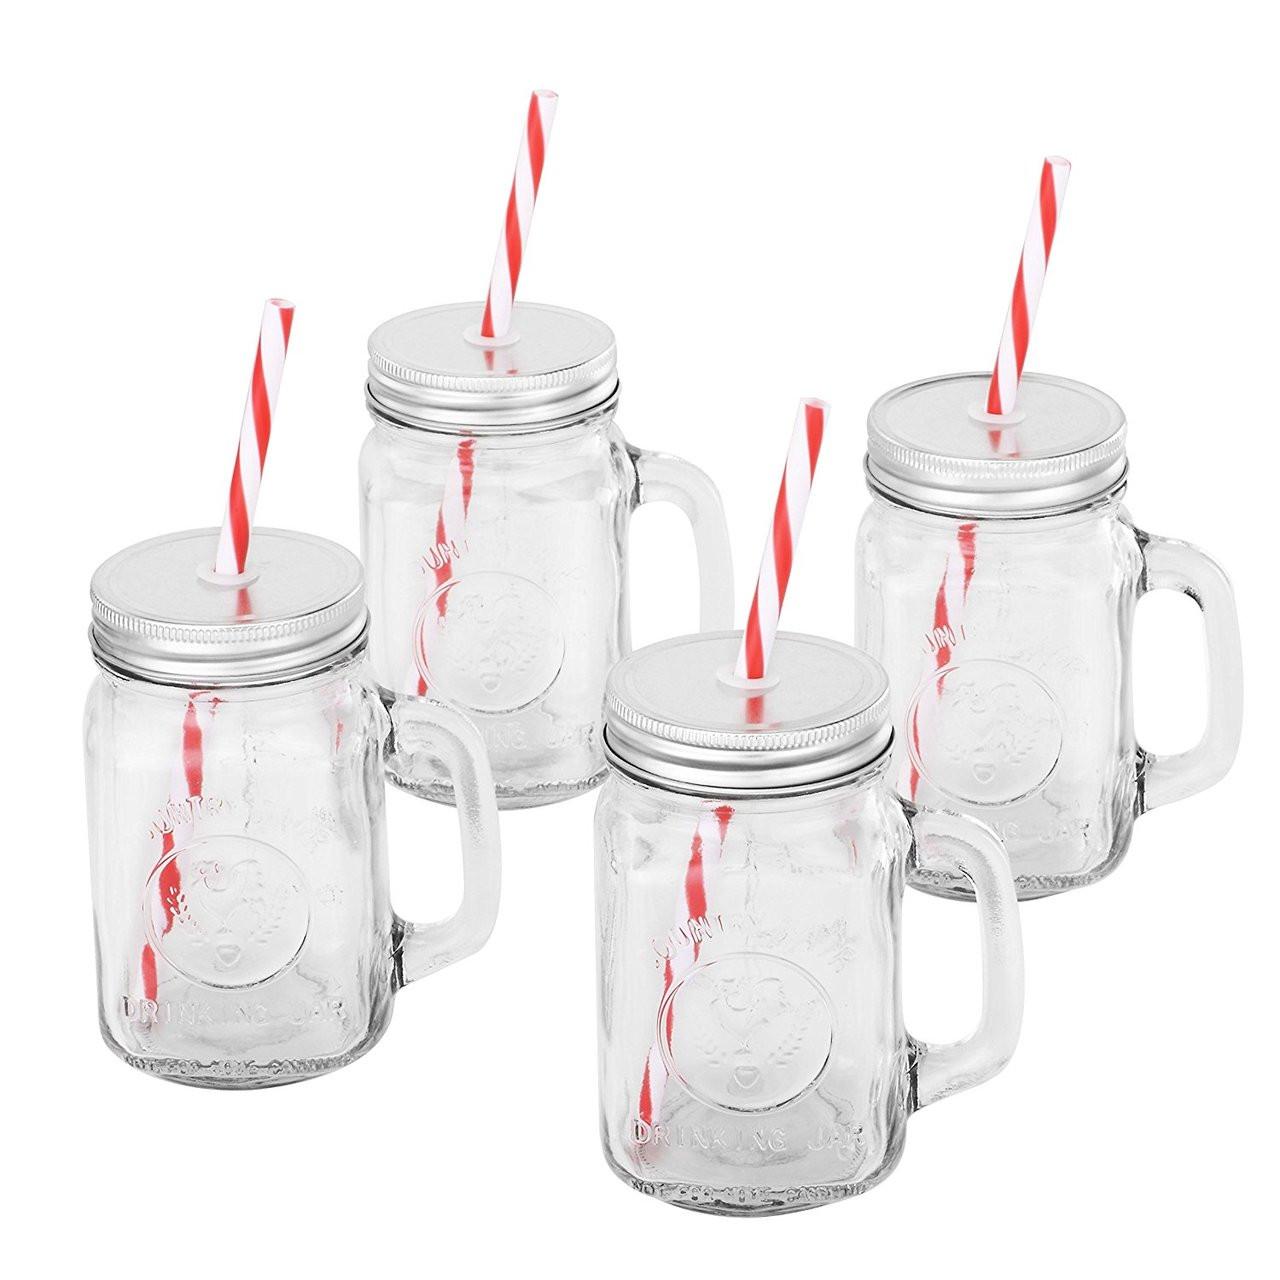 mason jar mugs with handle tin lid and plastic straws 16 oz each old fashion drinking glasses